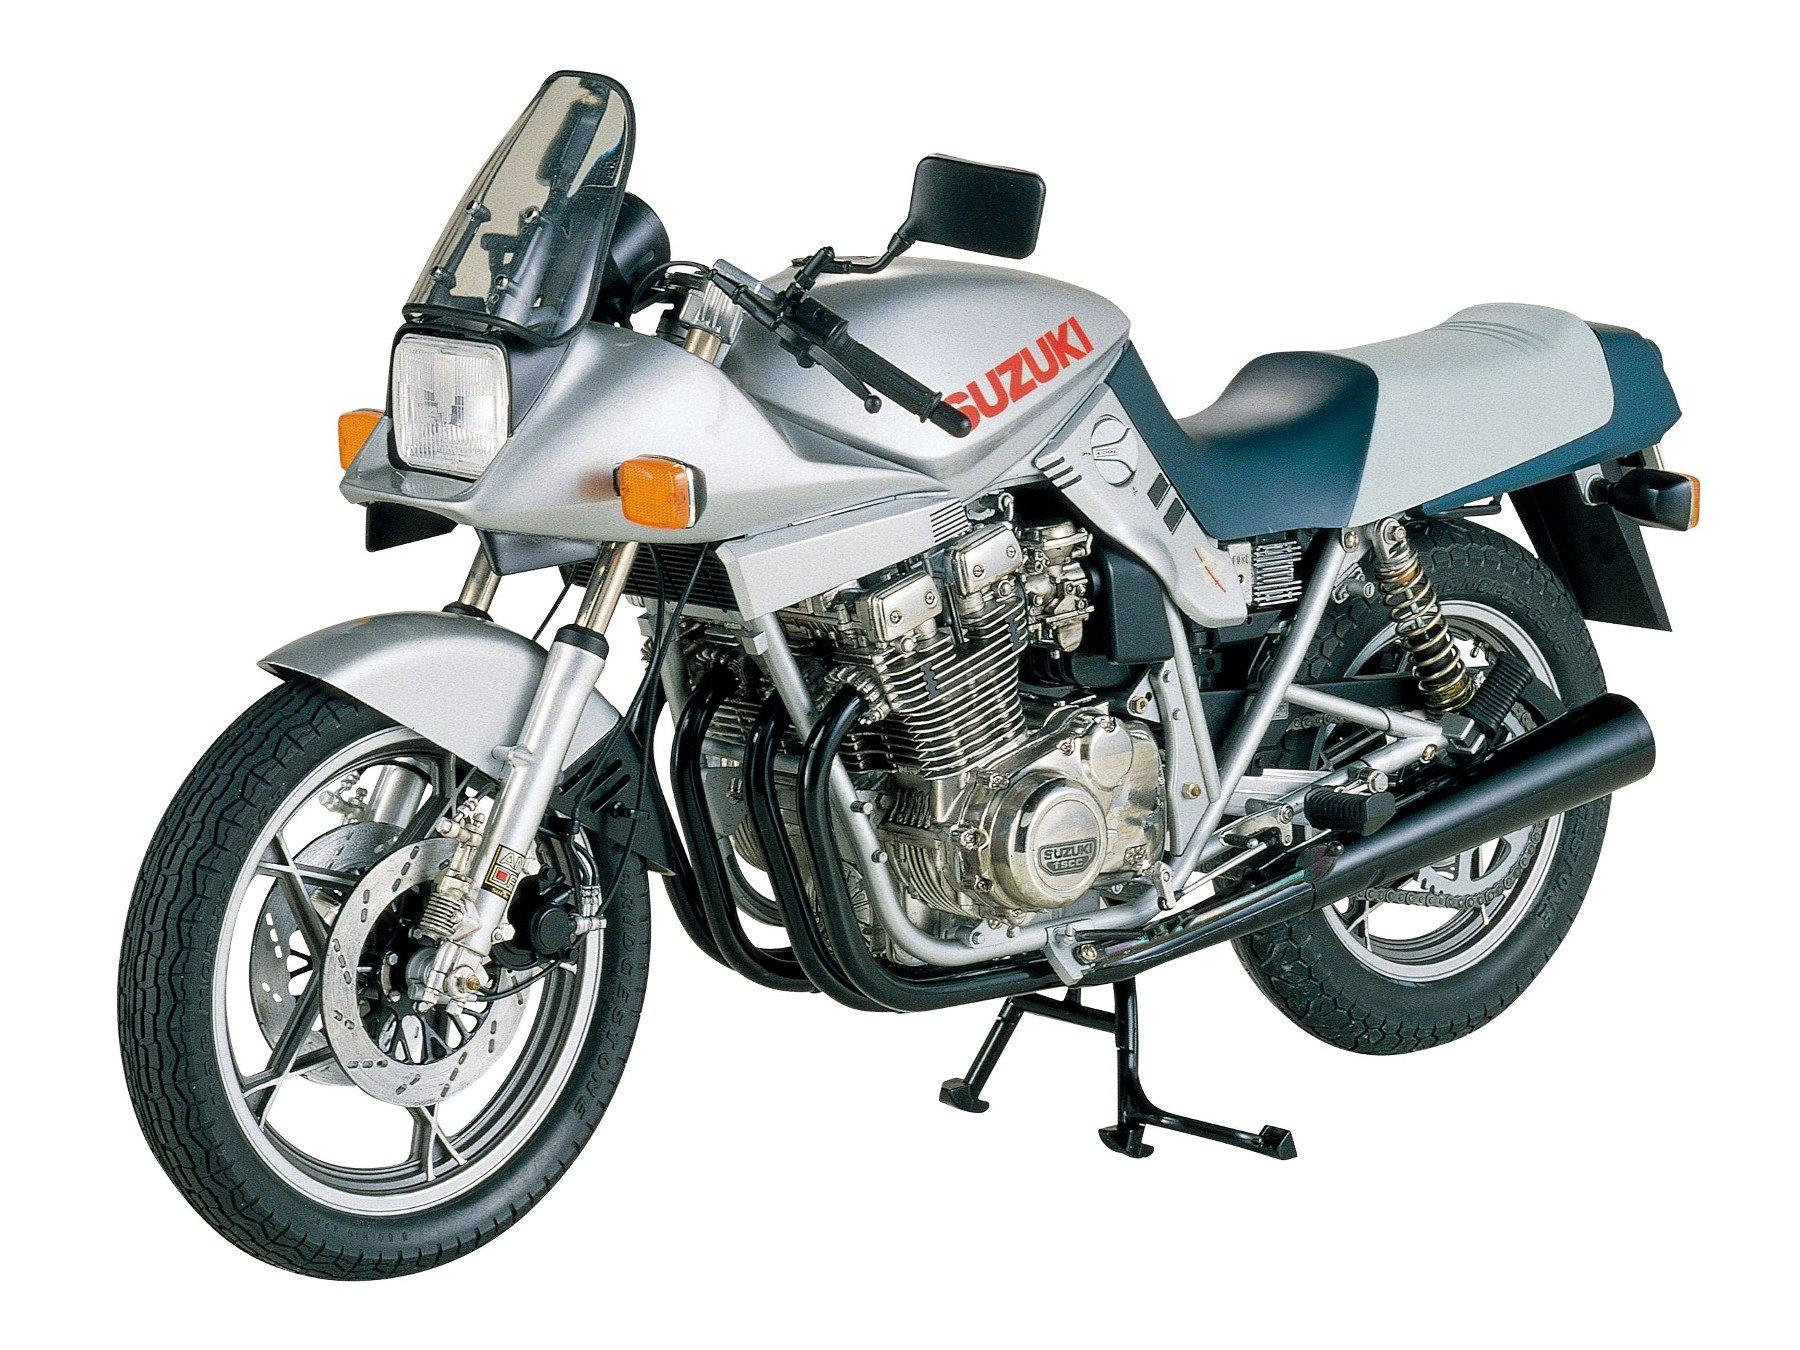 TAMIYA 1/6 Motorcycle Series No.25 Suzuki GSX 1100S Katana 【Japan Domestic Genuine Products】【Ships from Japan】